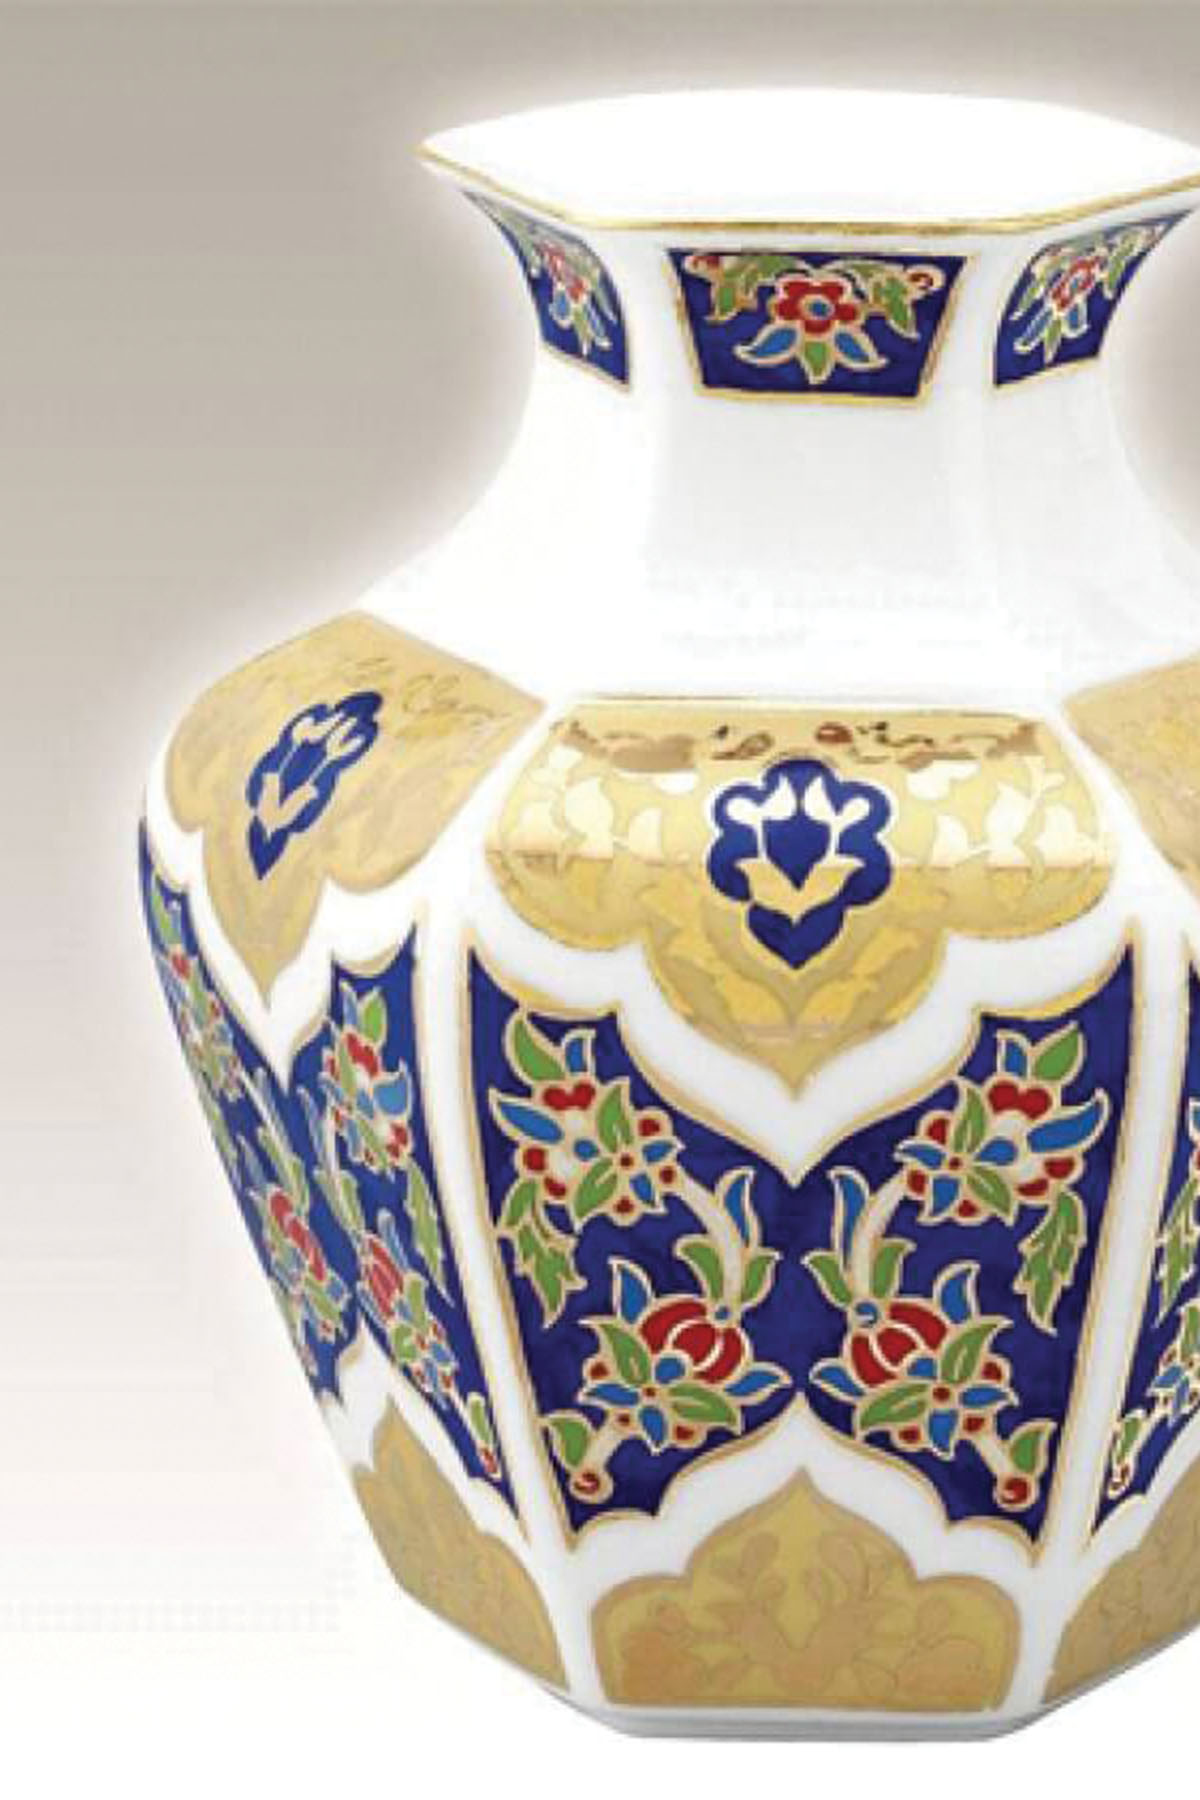 KÜTAHYA PORSELEN - Köşeli Vazo 15 Cm Dekor No:3880